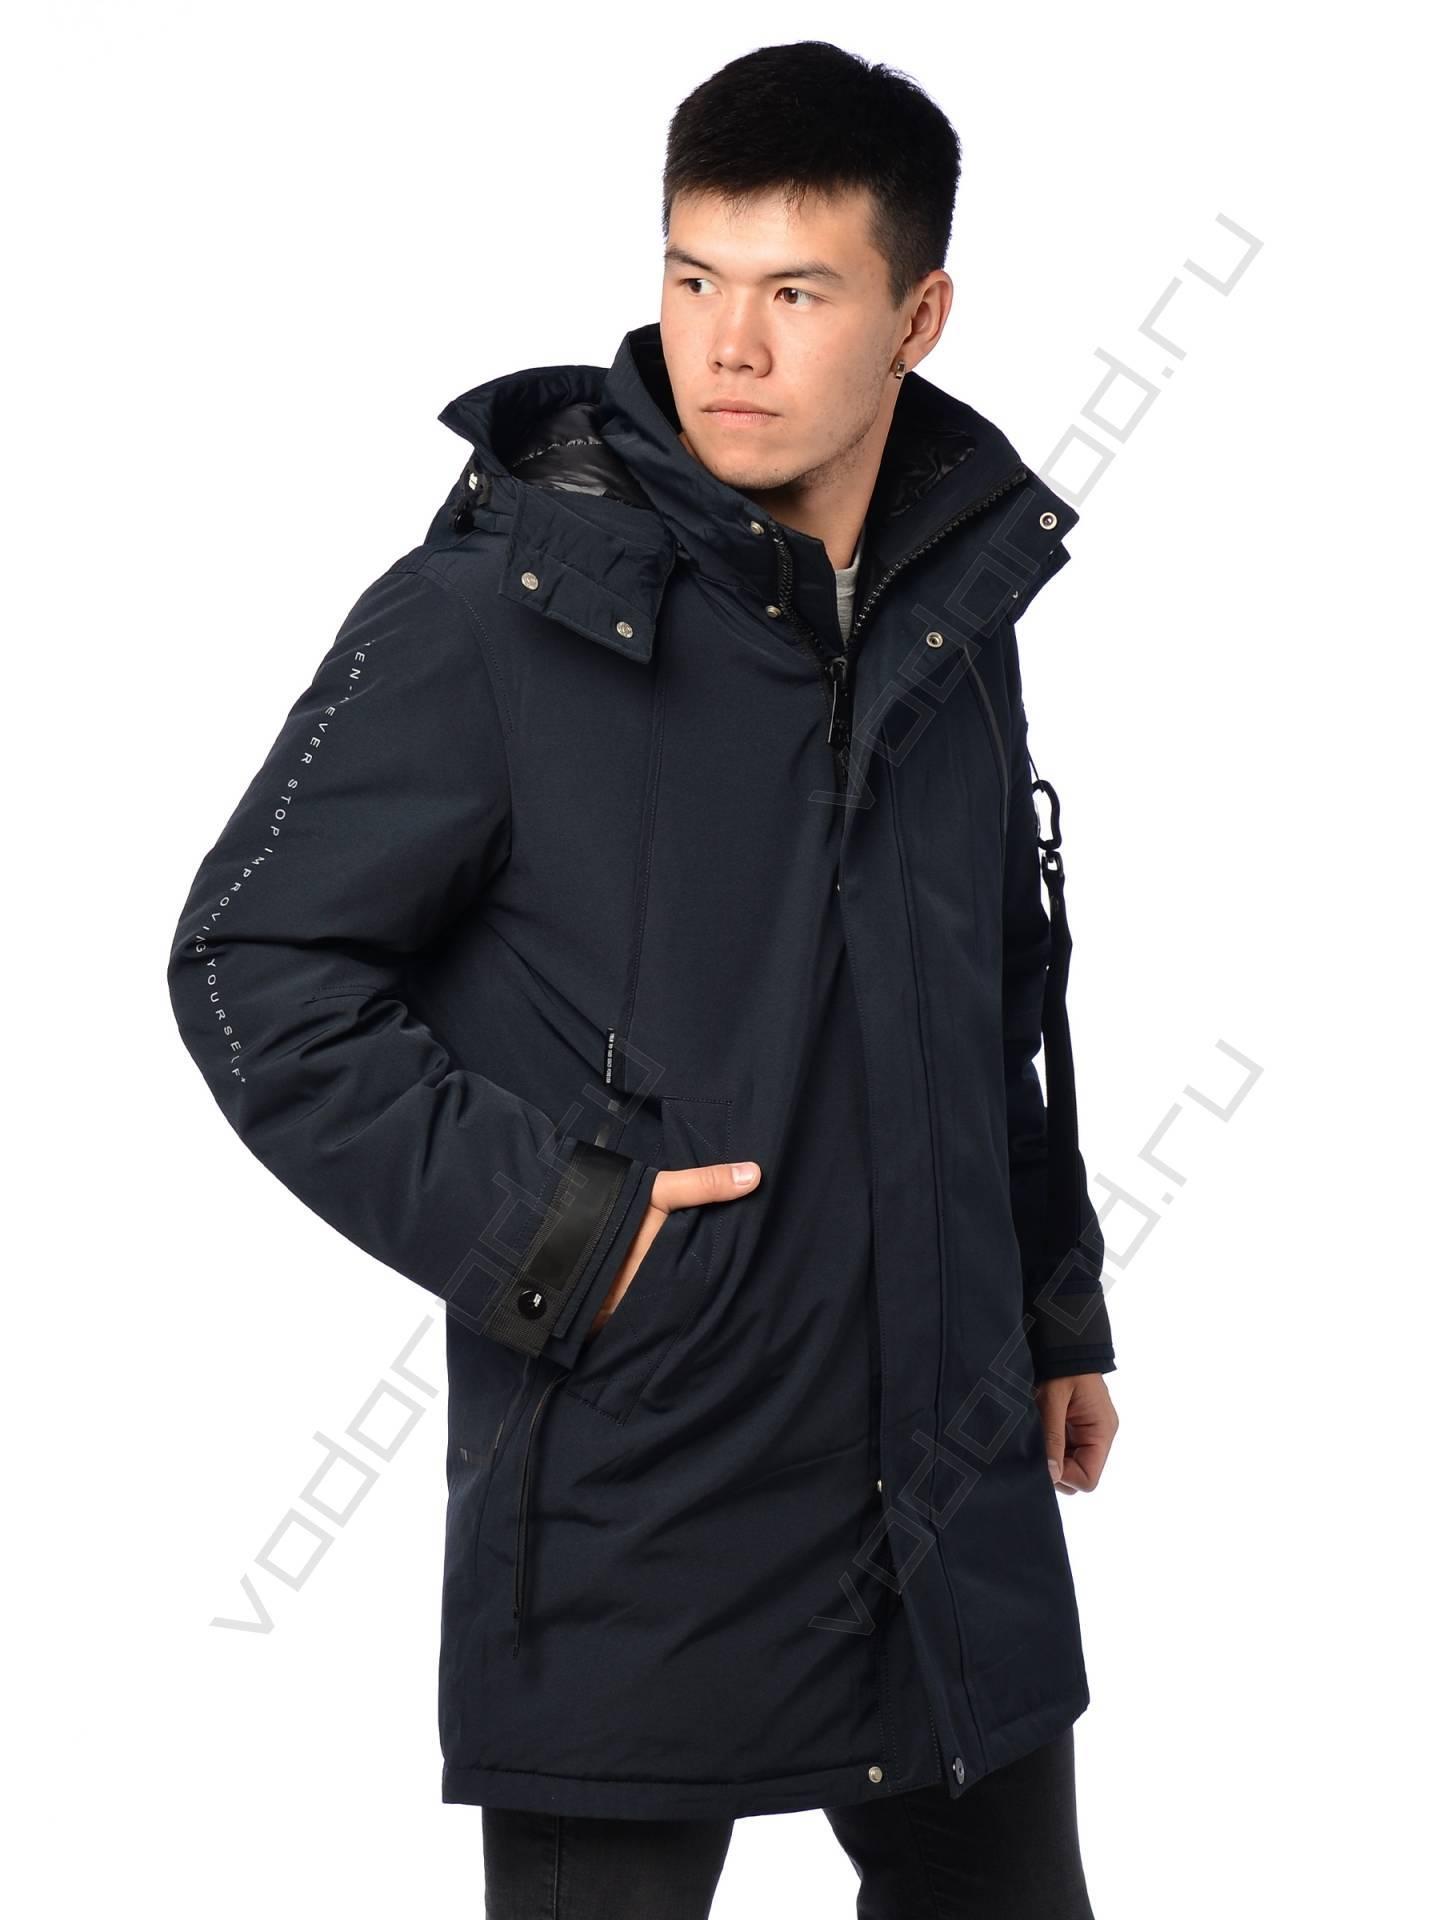 Куртка зимняя SHARK FORCE 21056 (темно-синяя) в Хабаровске